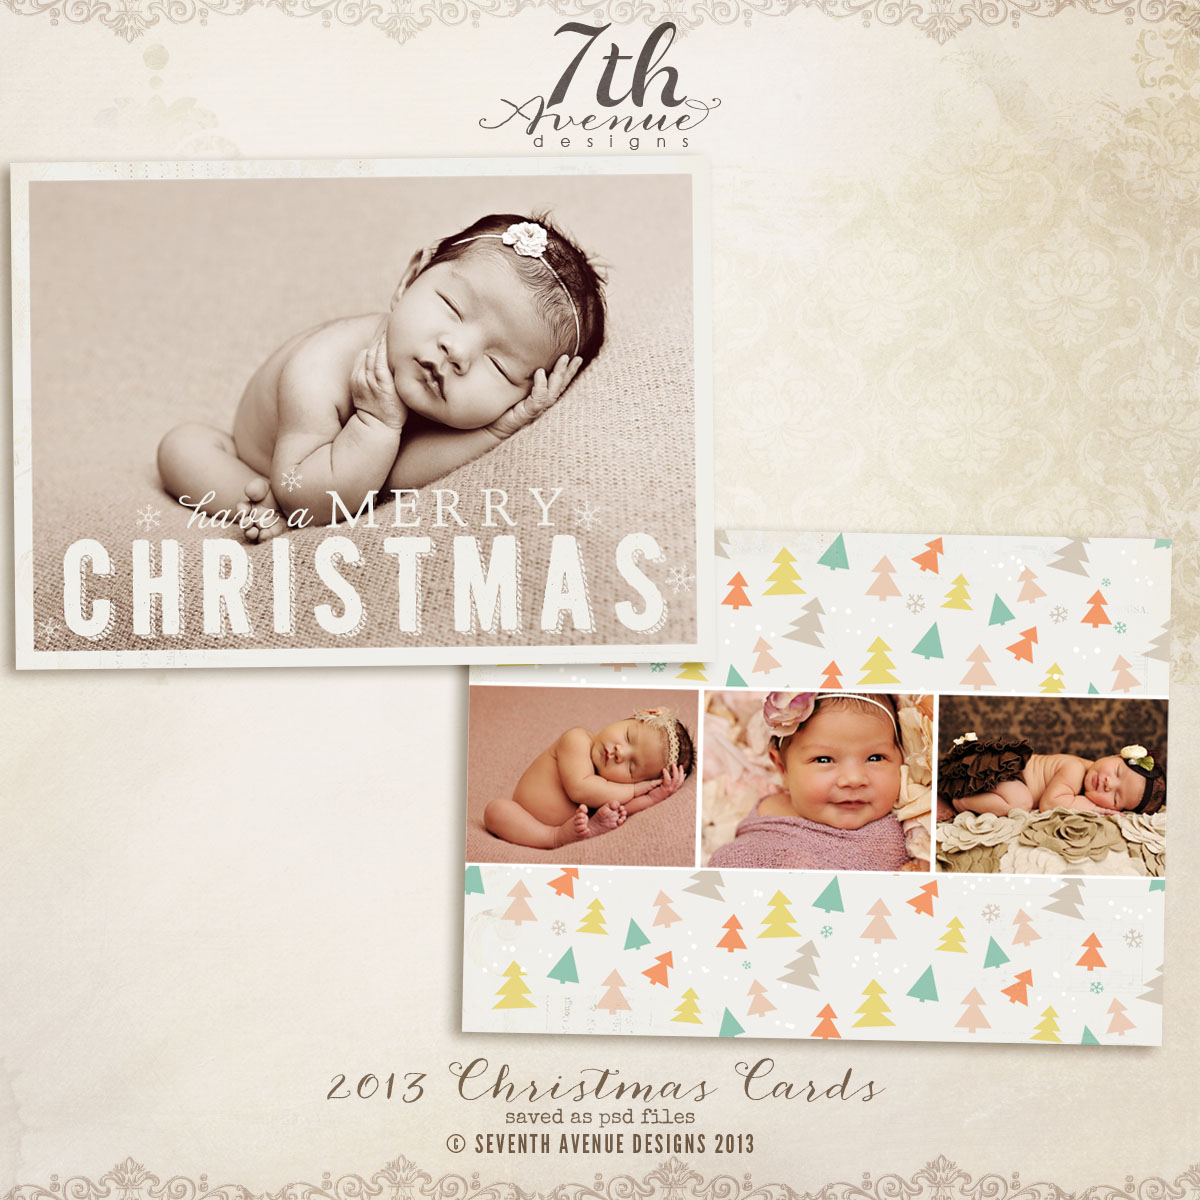 free christmas card 2013 freecc2013 it s free 7thavenue